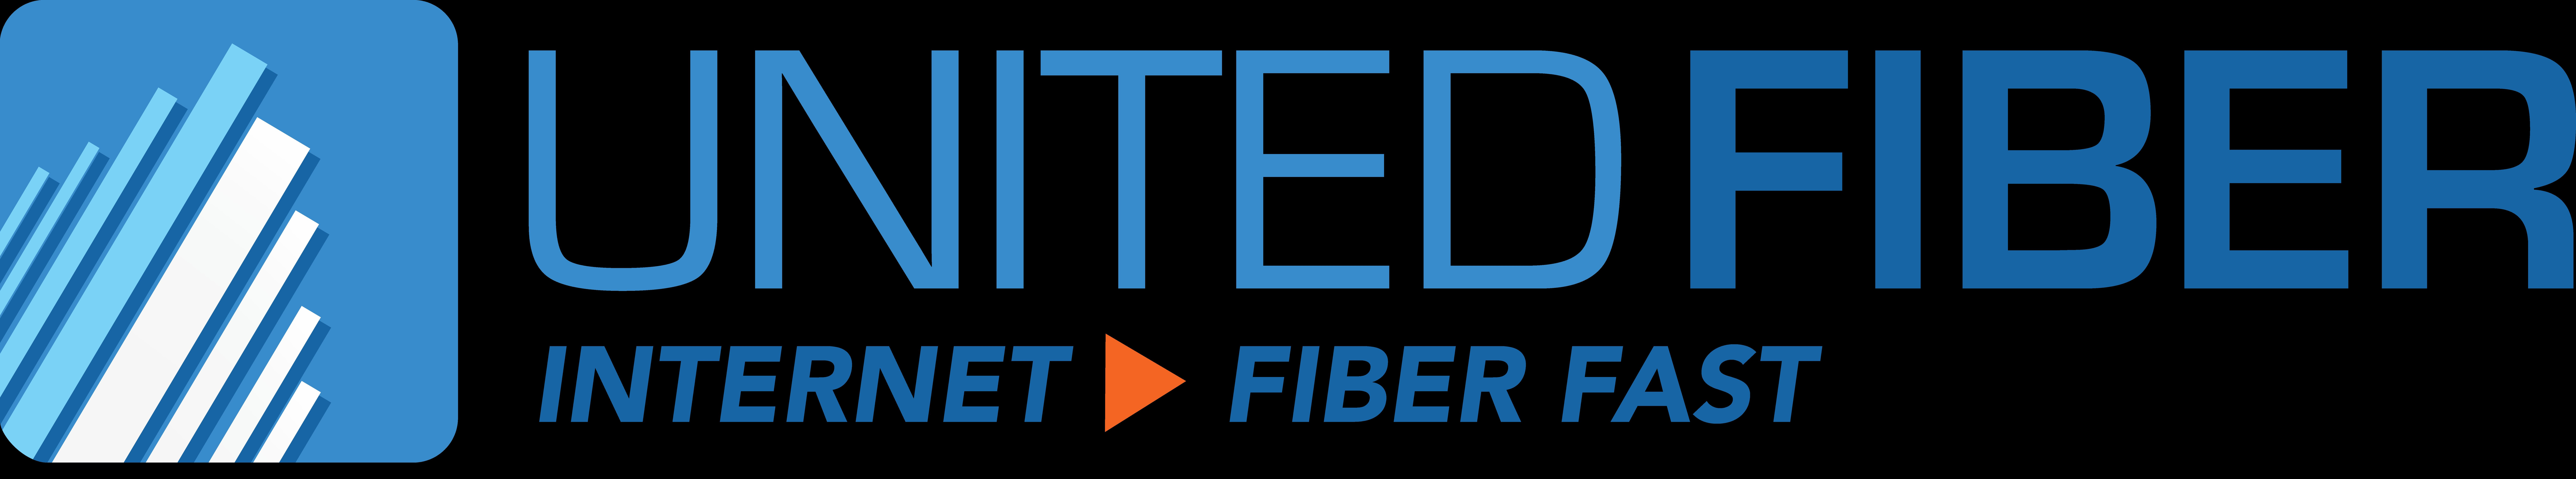 United Fiber